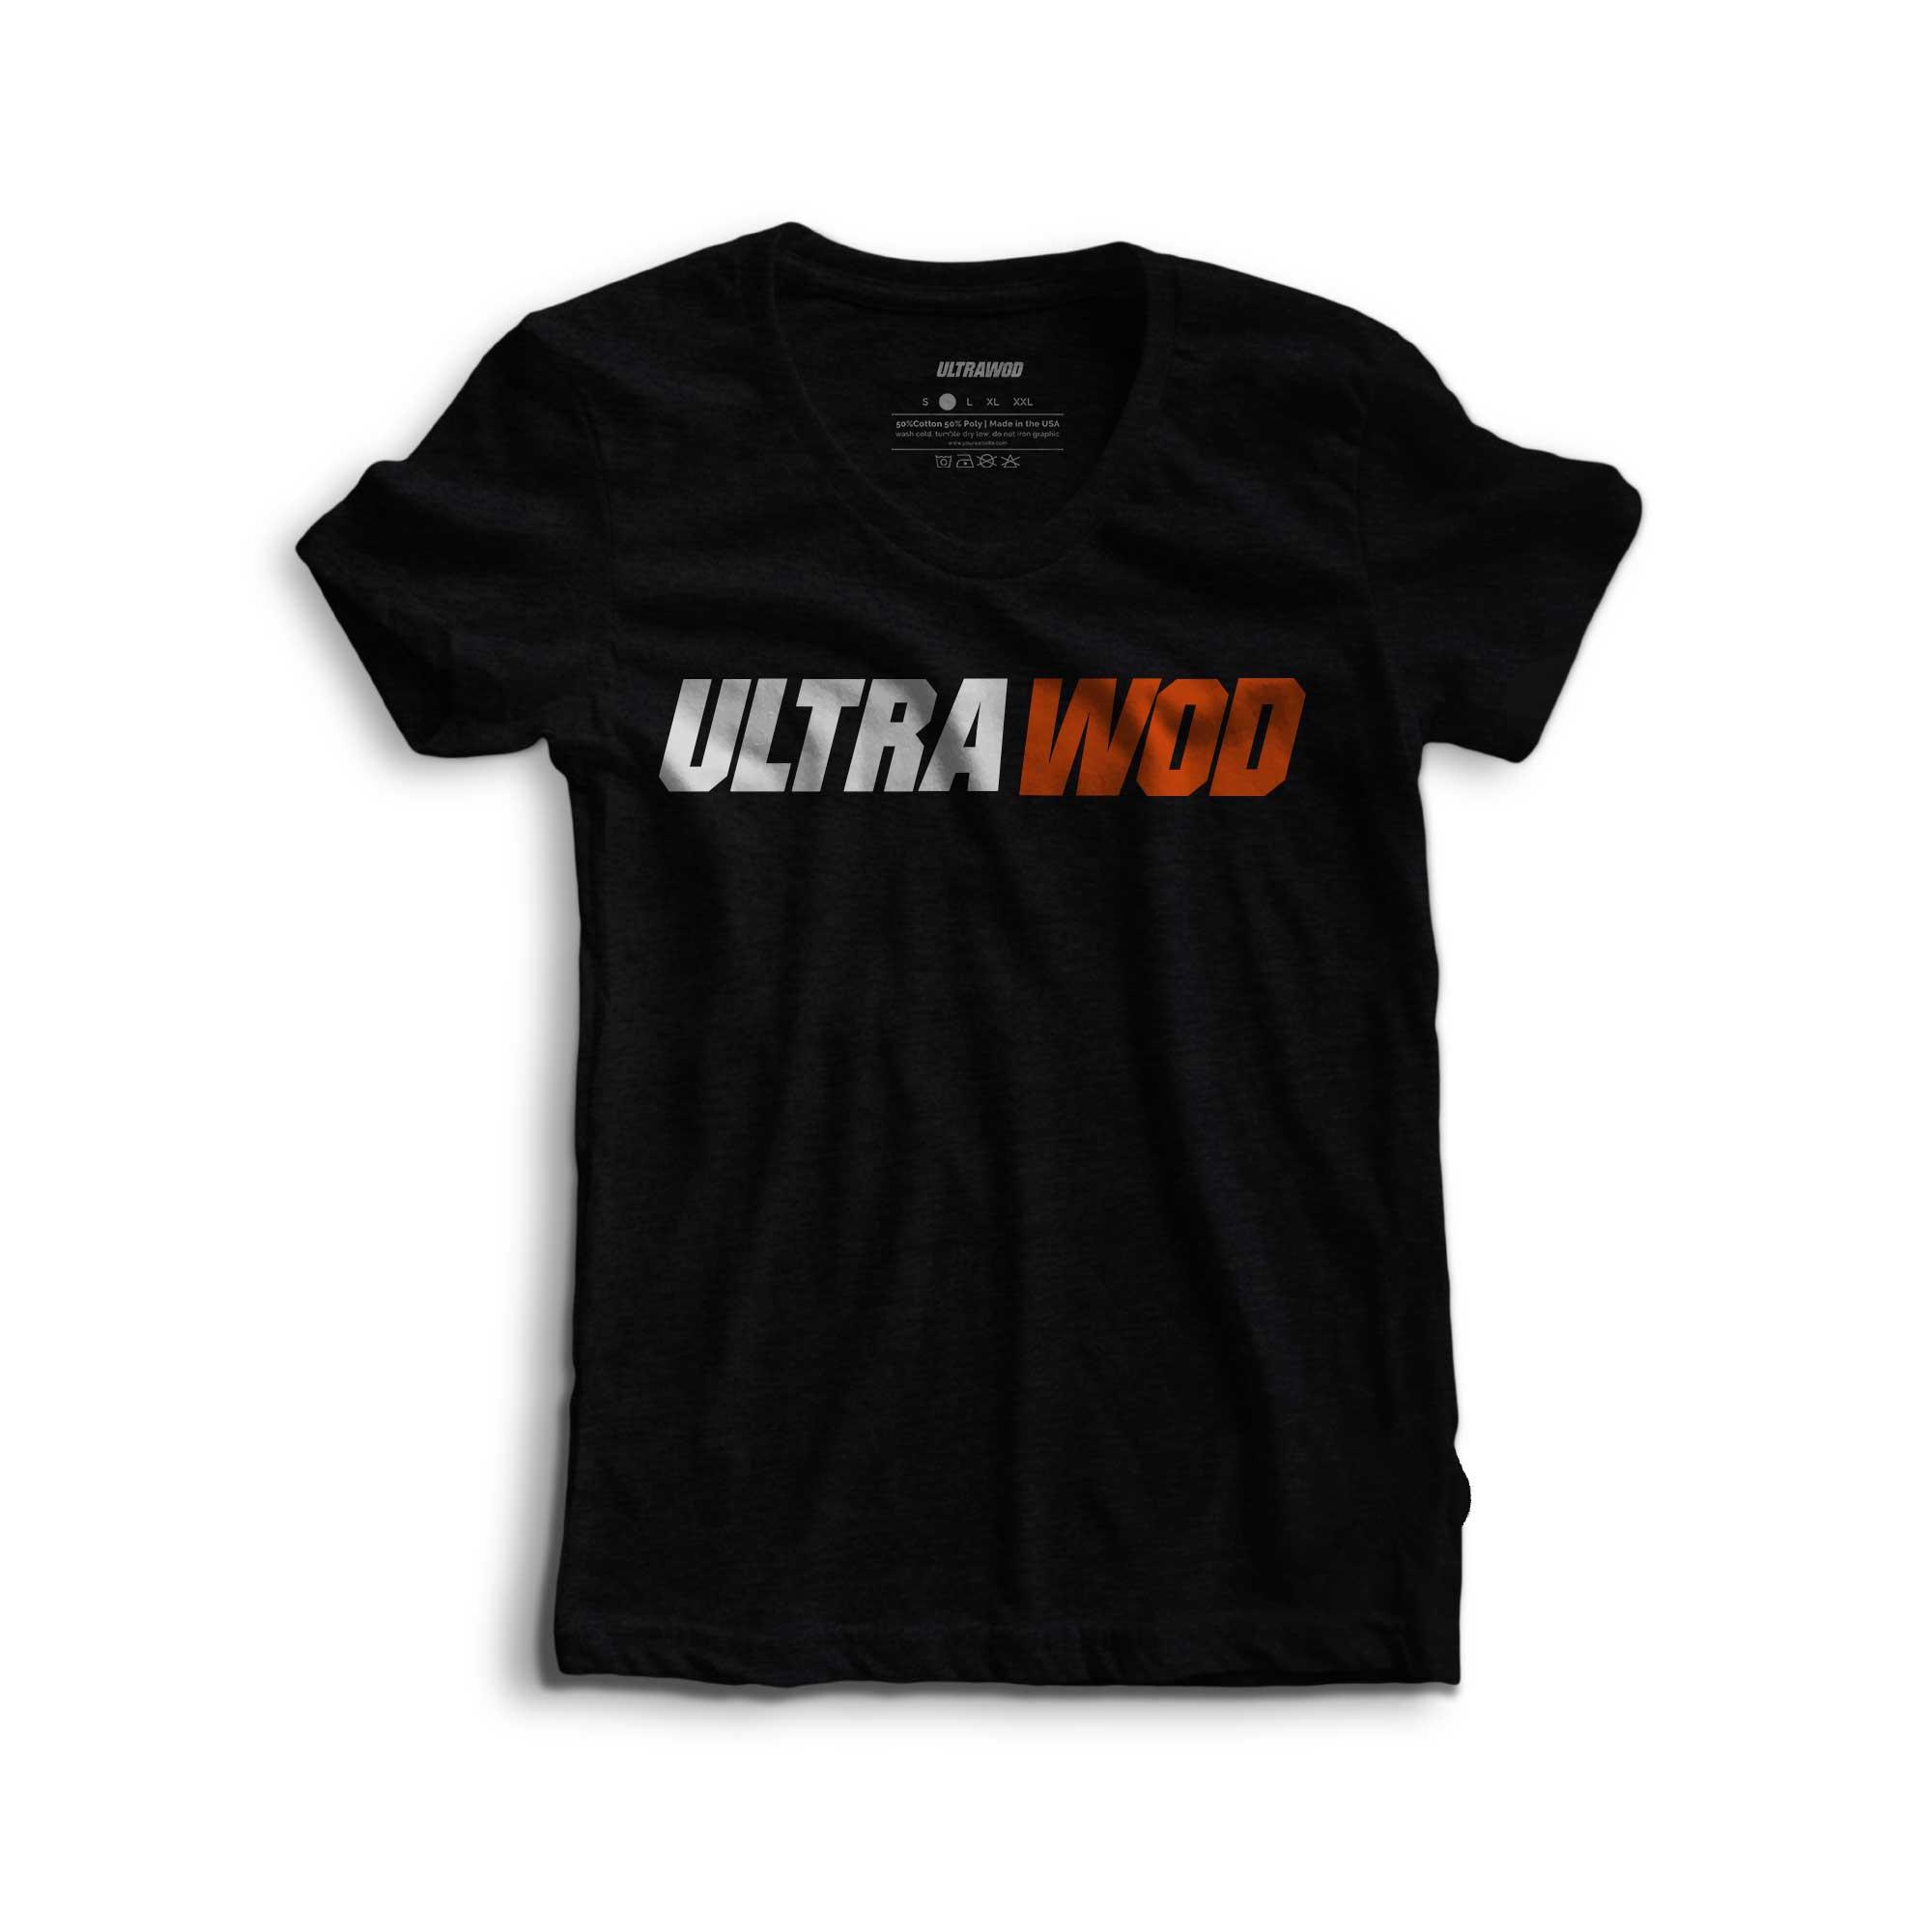 Camiseta UltraWod Classica Feminina  - ULTRAWOD